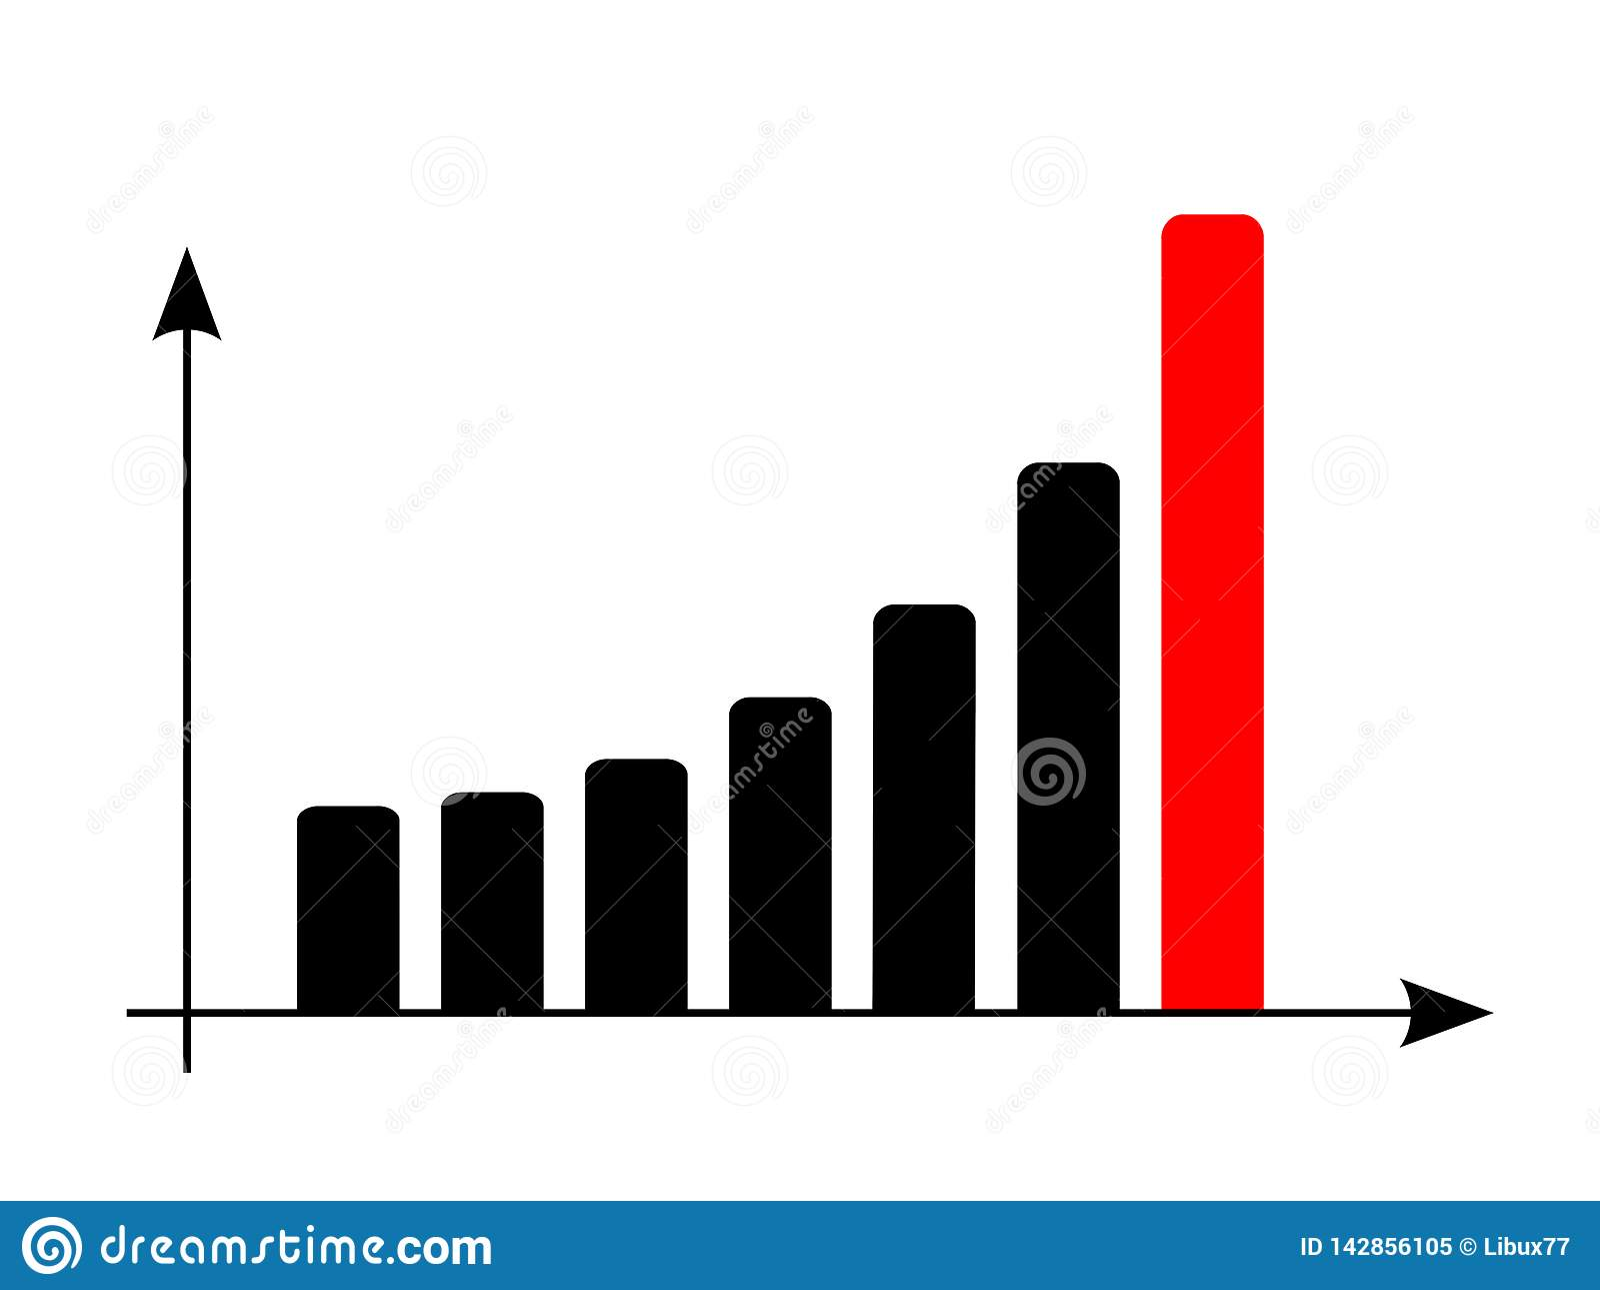 Data Report Bar Graph Grow Or Success Profit Diagram Concept Stock on data diagram, division diagram, 5th grade math tape diagram, statistics diagram, probability diagram, scientific law diagram, pie graph diagram, bar diagram math, bar diagrams examples, flowchart diagram, whole numbers diagram, percentage bar diagram, bar model diagram, bar schematics, outlier diagram, torsion bar suspension diagram, sample bar diagram, histogram diagram, square diagram, contour map diagram,